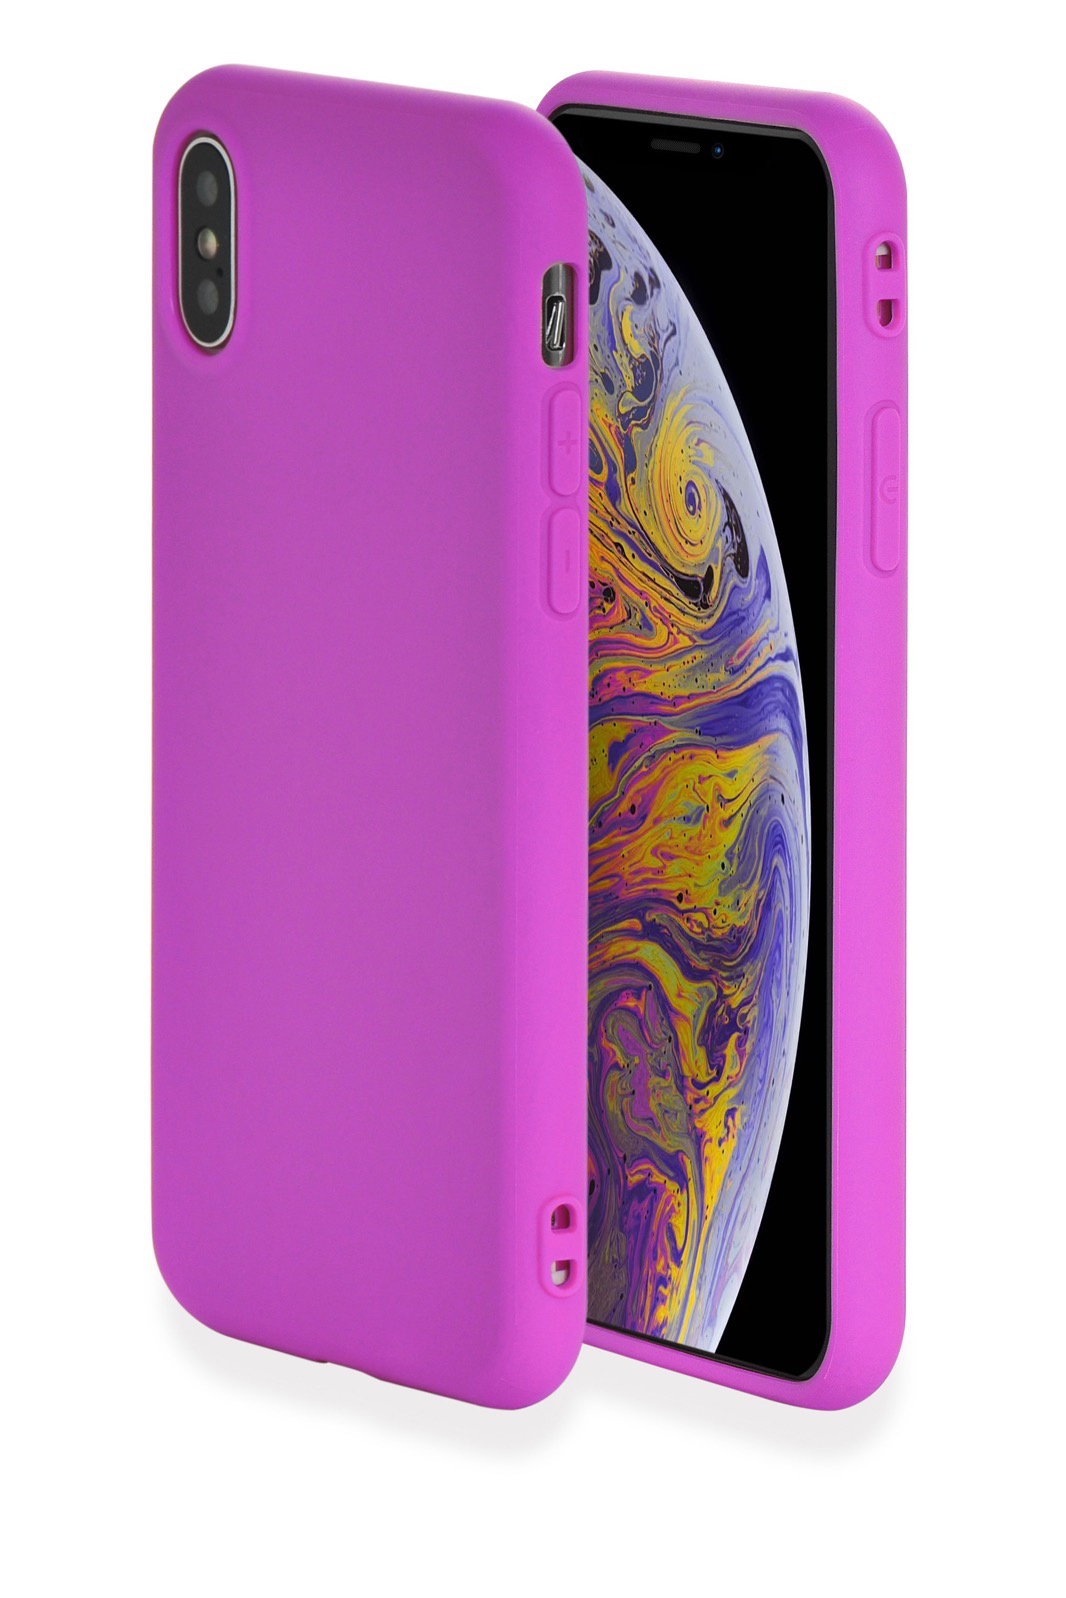 "Чехол для сотового телефона Gurdini Чехол накладка Soft Lux силикон (4) для Apple iPhone XS Max 6.5"",907118, пурпурный, темно-розовый"